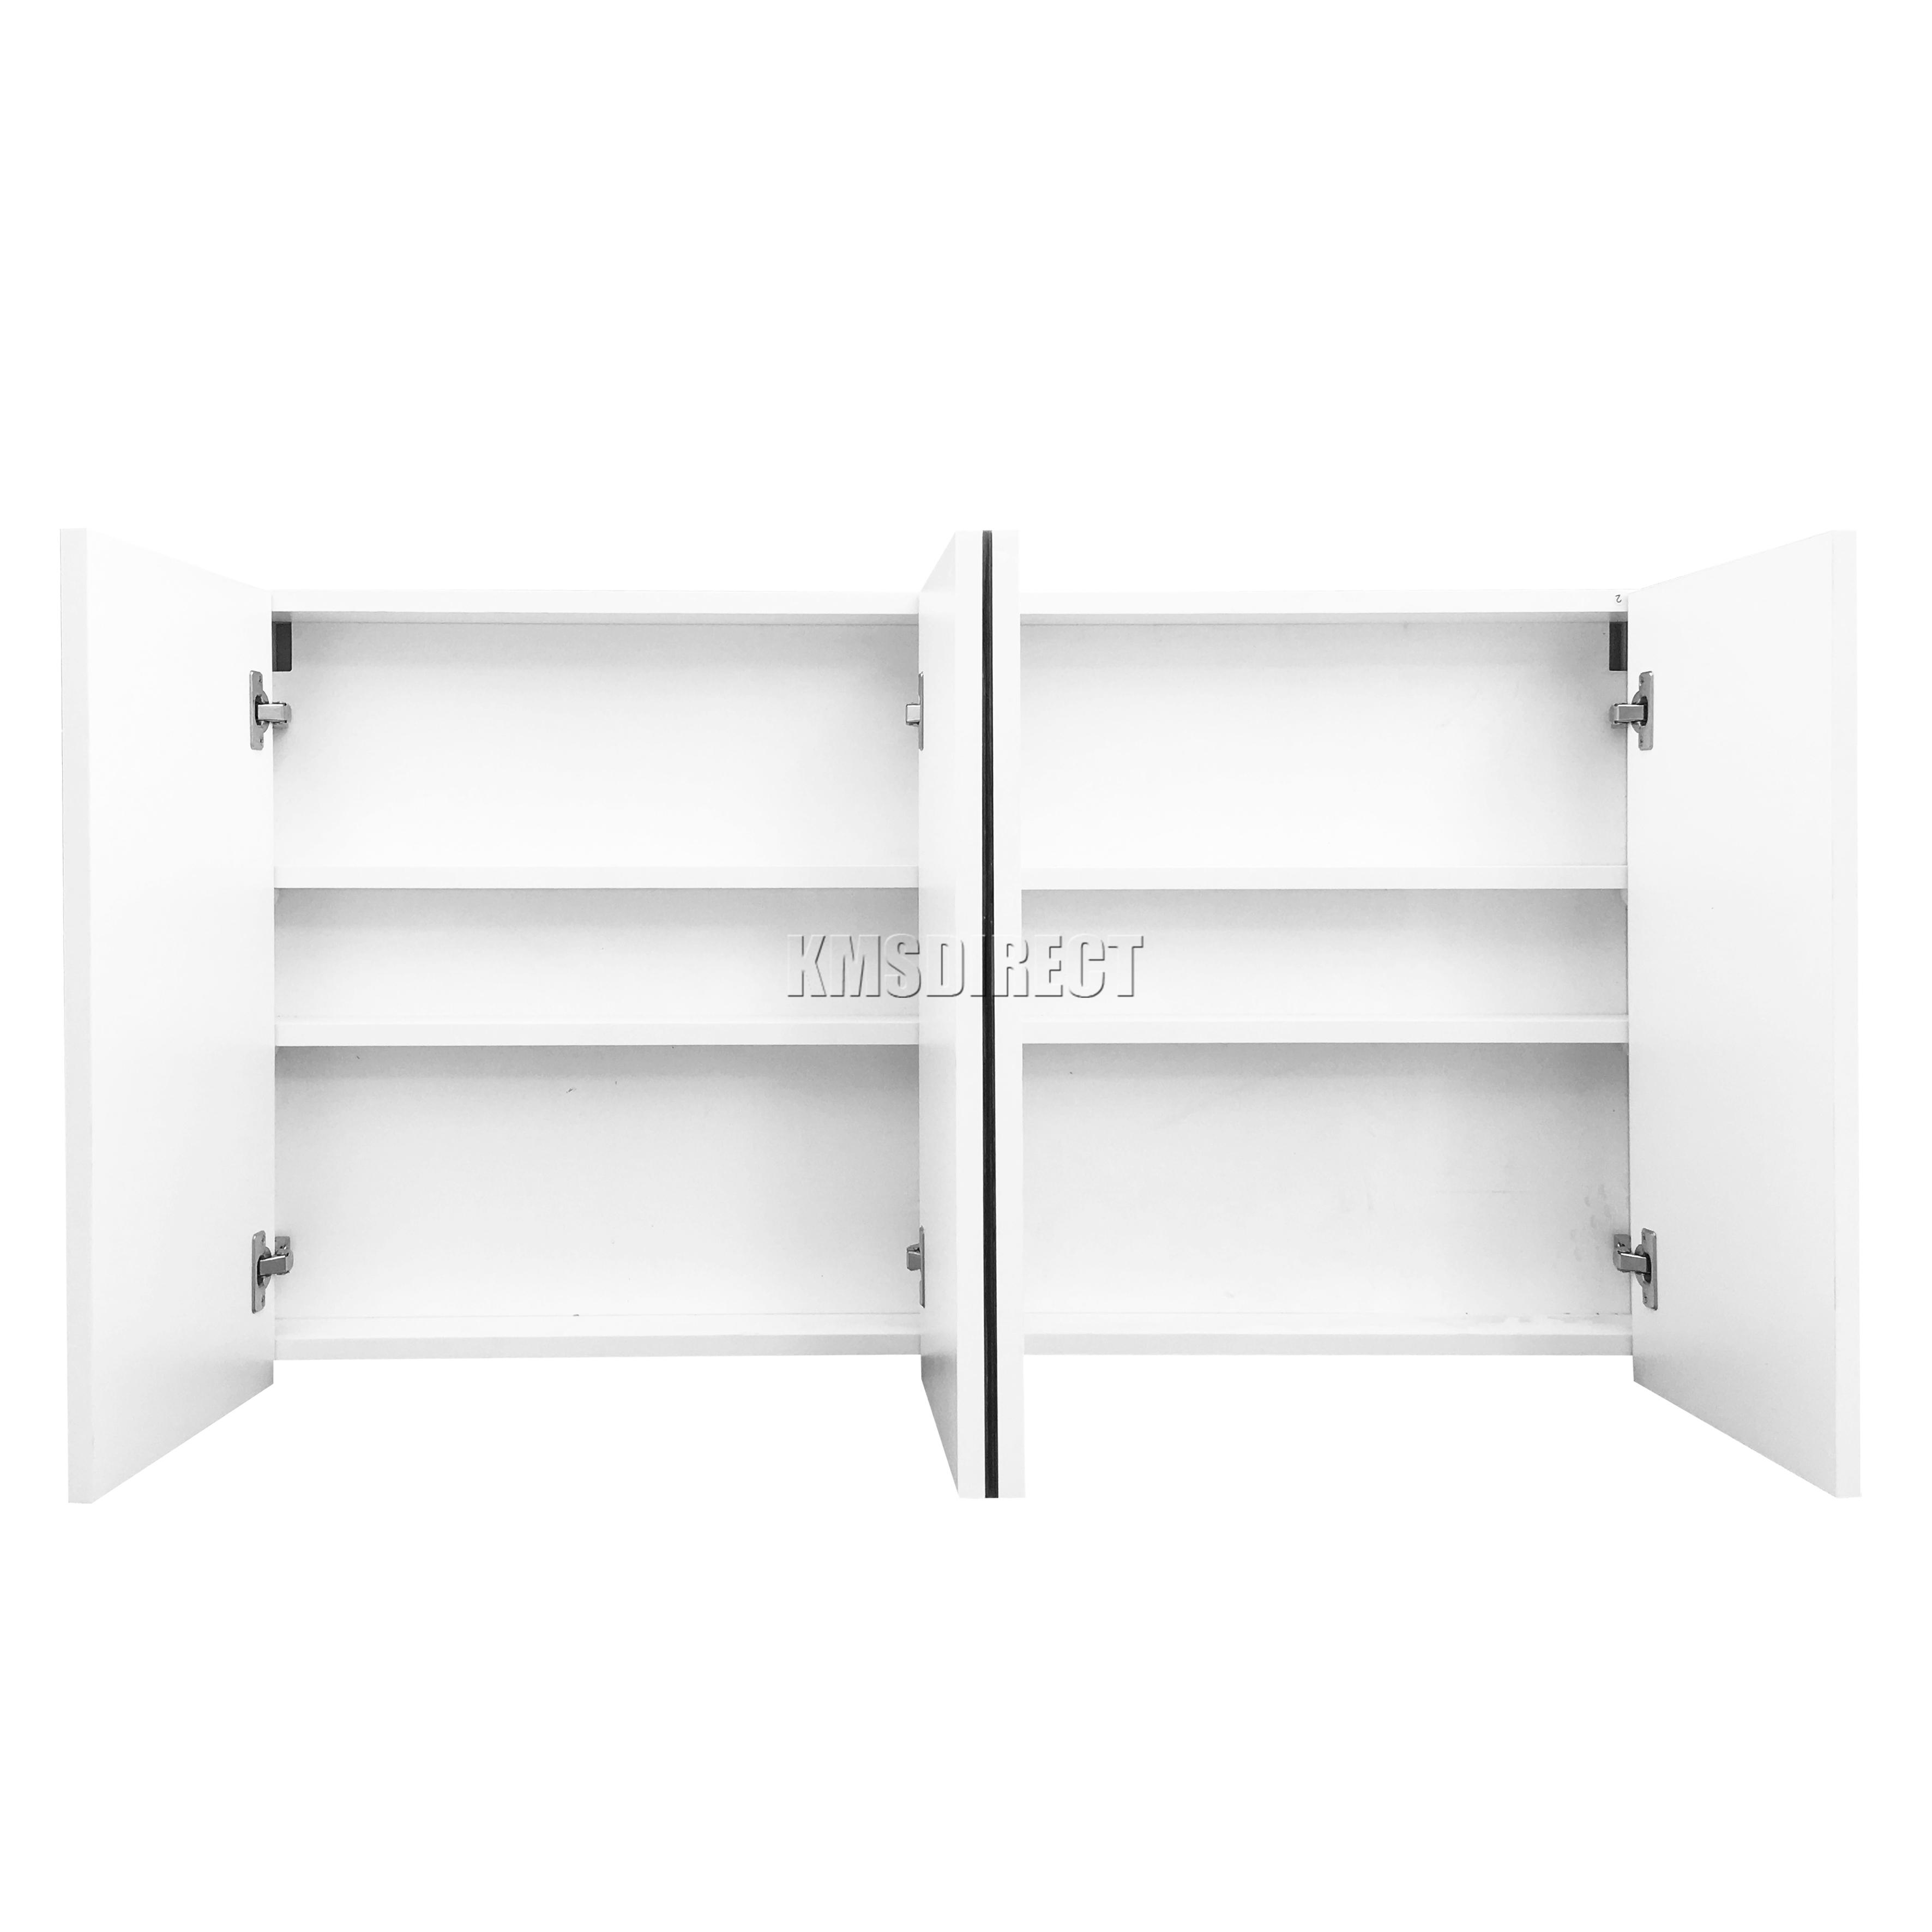 FoxHunter Wall Mount Mirror Bathroom Cabinet Unit Storage